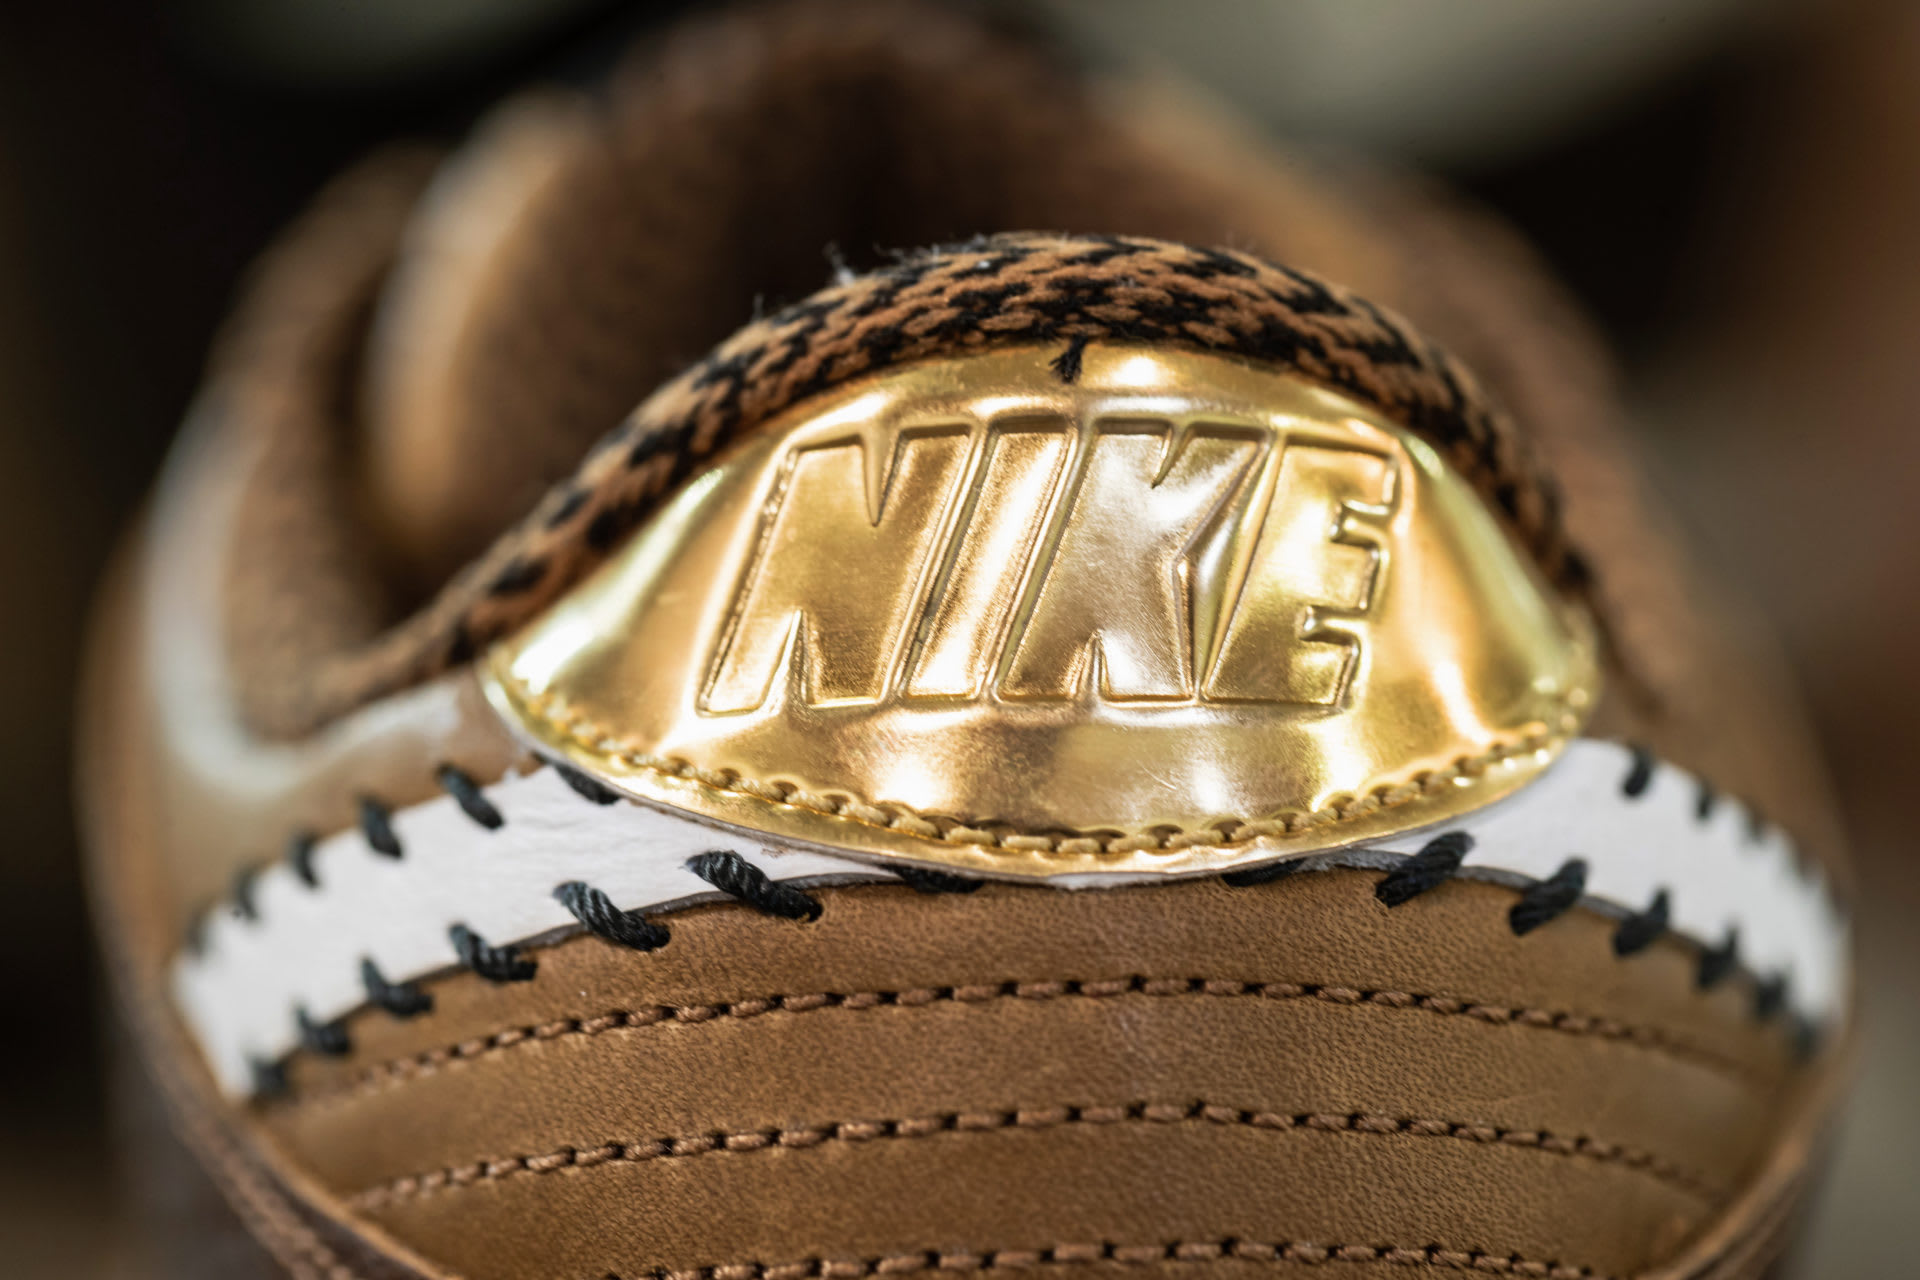 Nike Dunk Low PRM QS Paris 'Ale Brown' AH1072-200 (Heel)